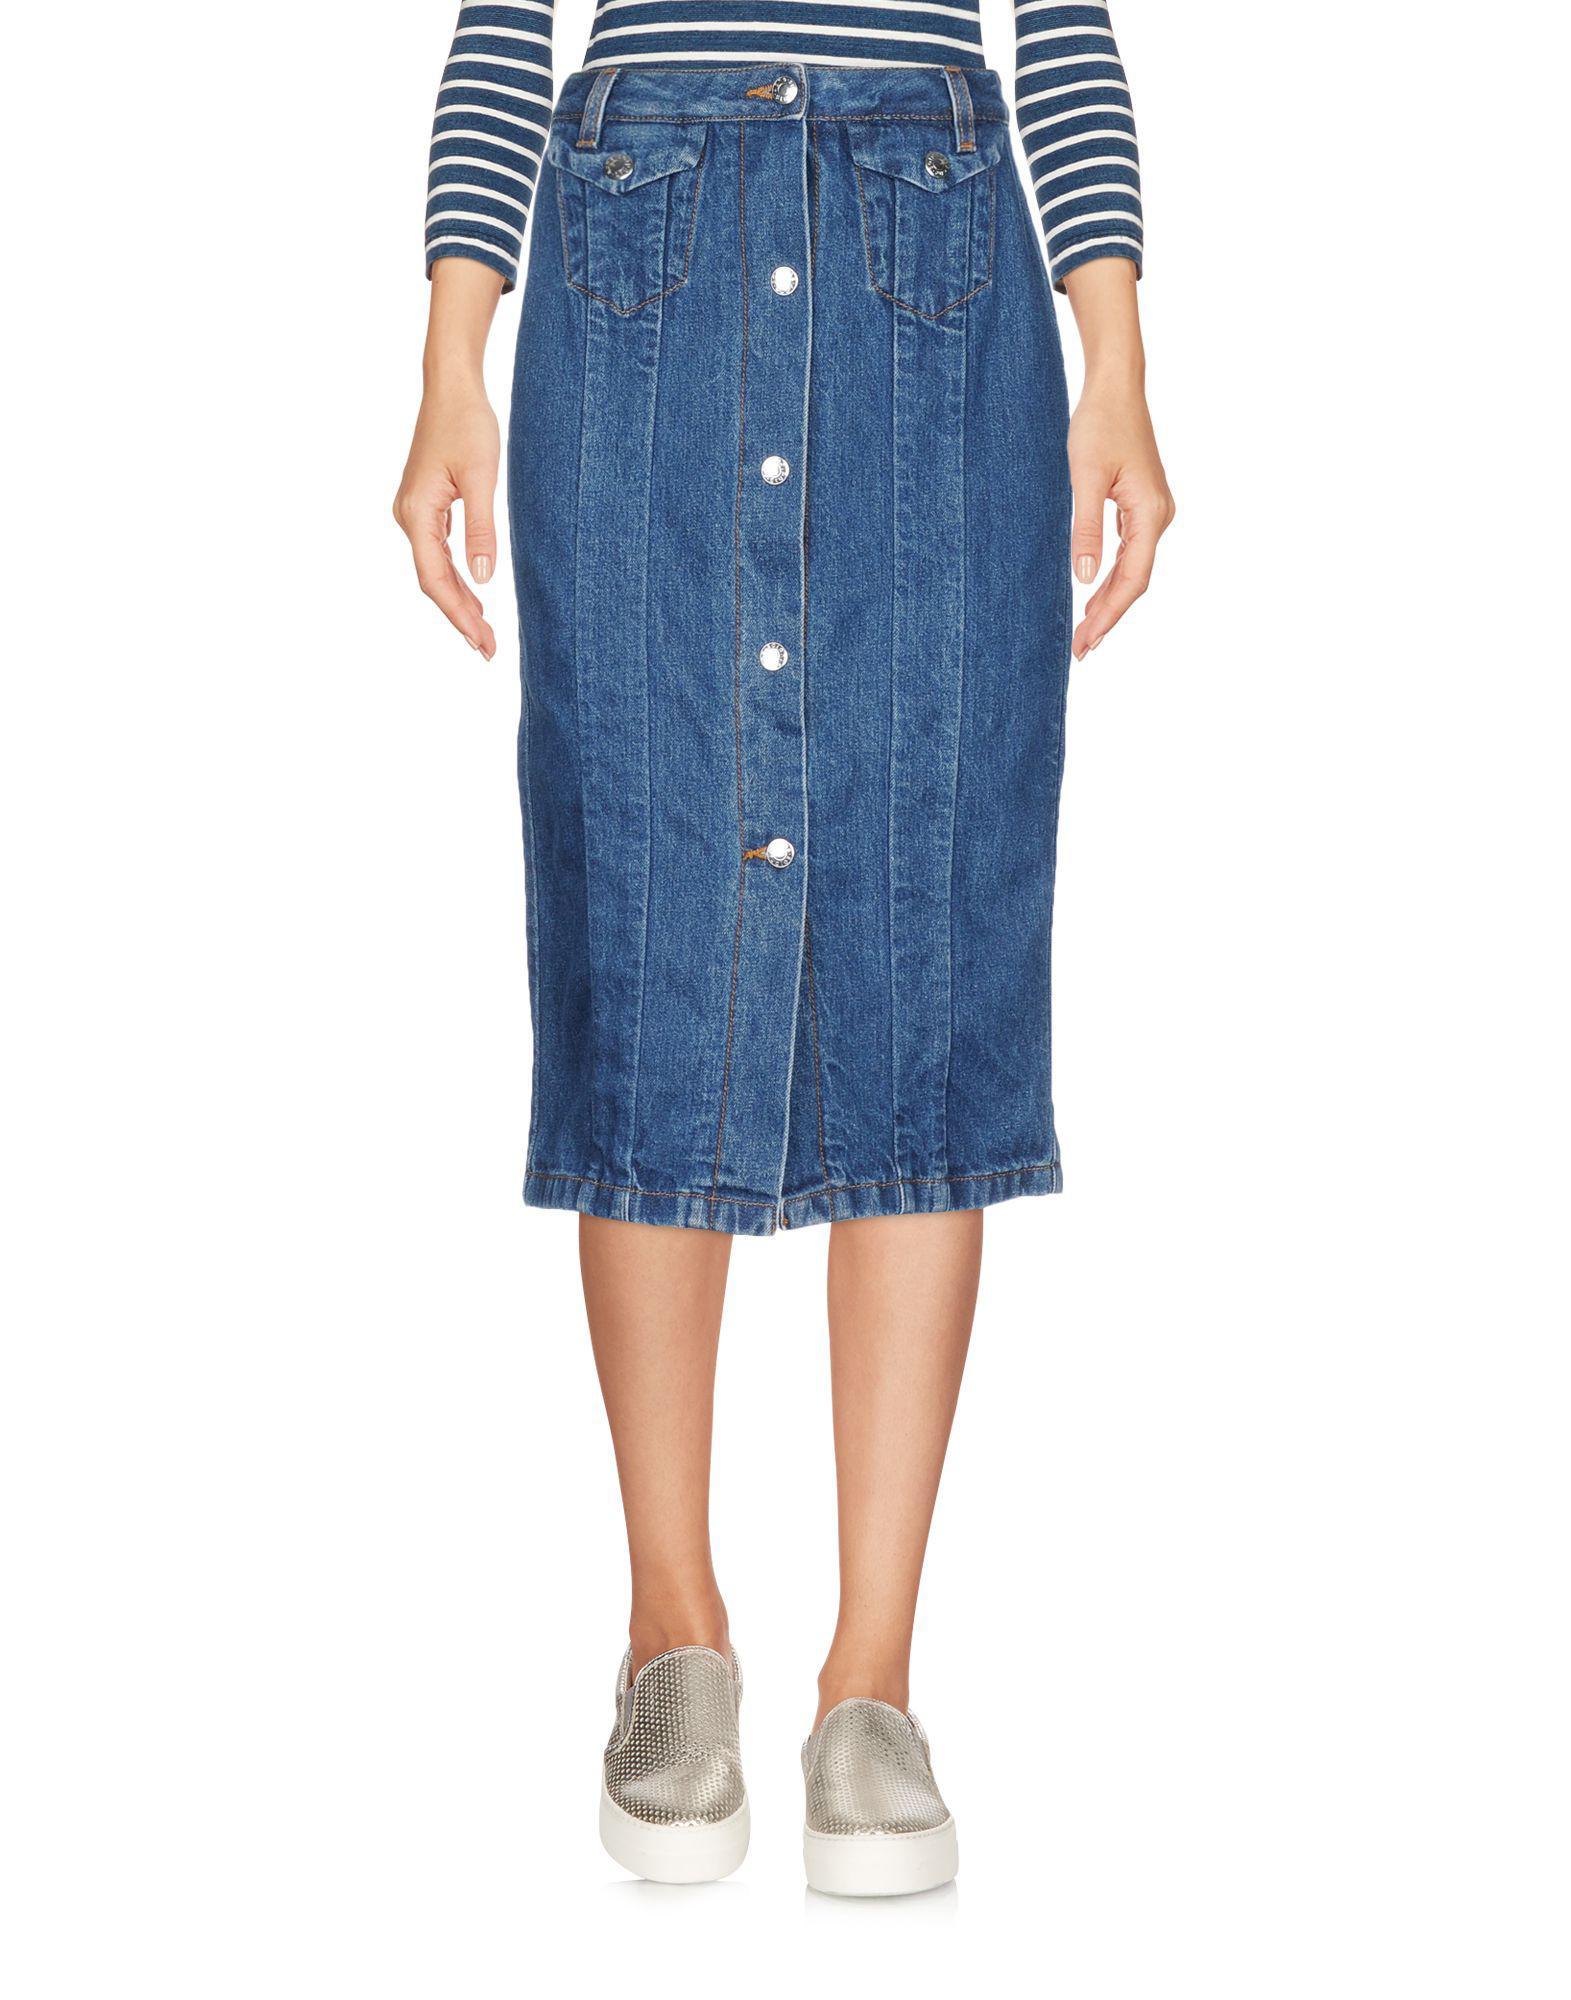 4995e8b28a83 Acne Studios. Jupe en jean femme de coloris bleu